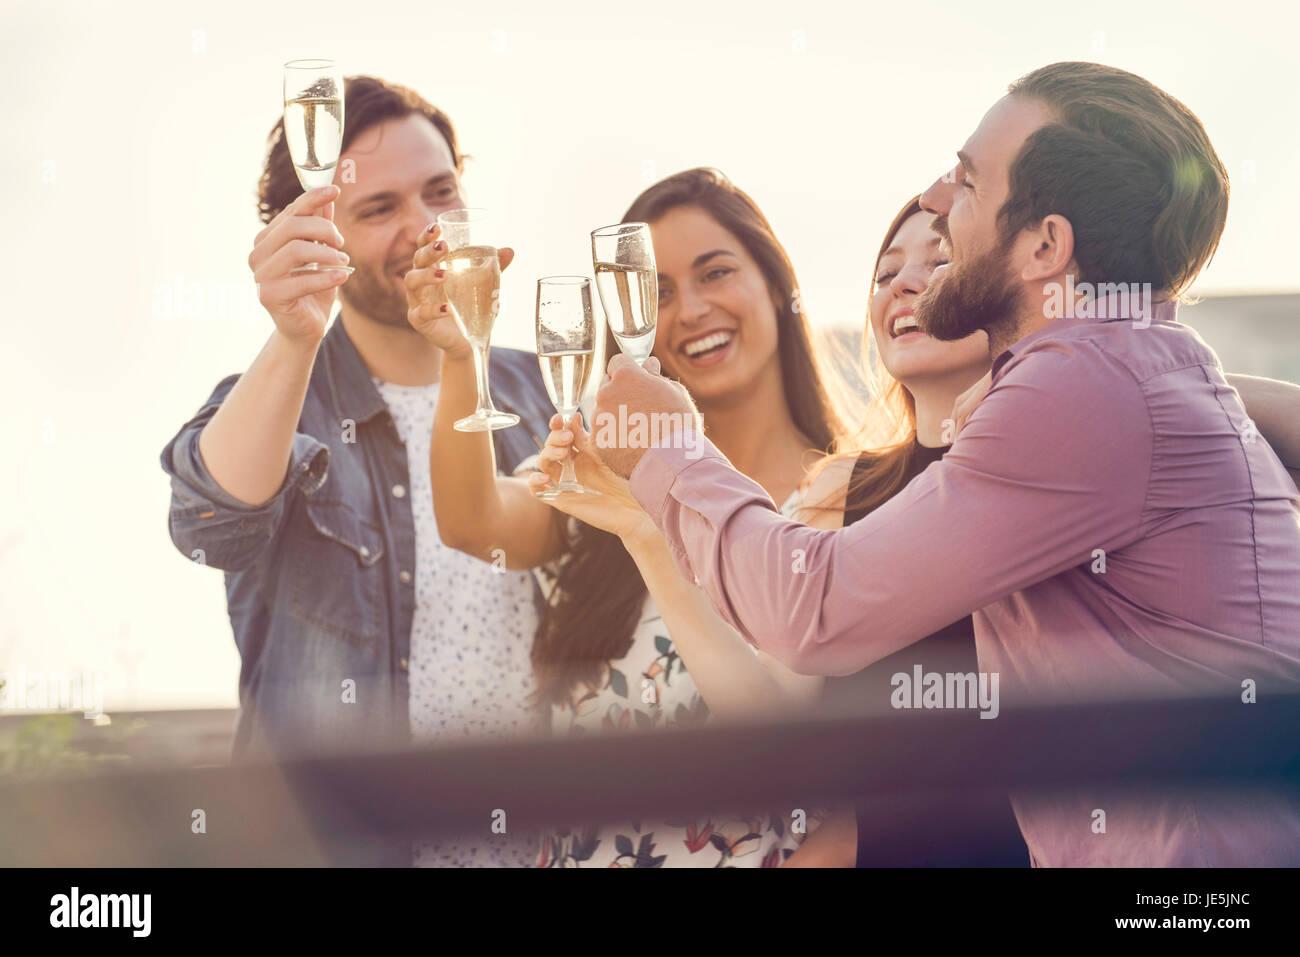 Amigos beber champán junto al aire libre Imagen De Stock